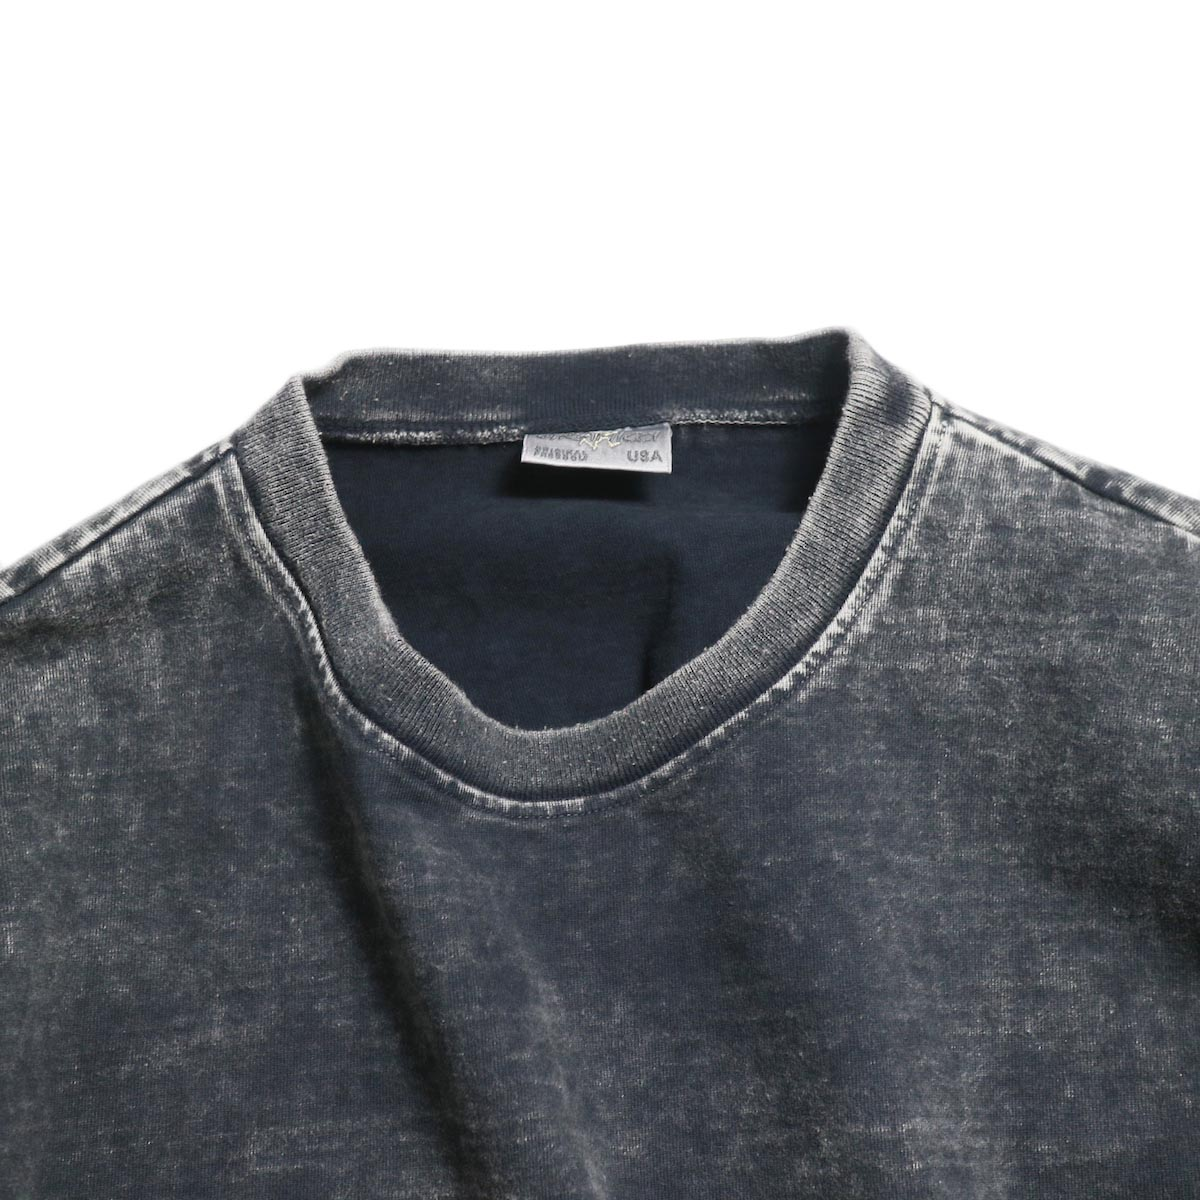 N.HOOLYWOOD × Gramicci  / 191-CS27-024 Short Sleeve Tee -Black 襟